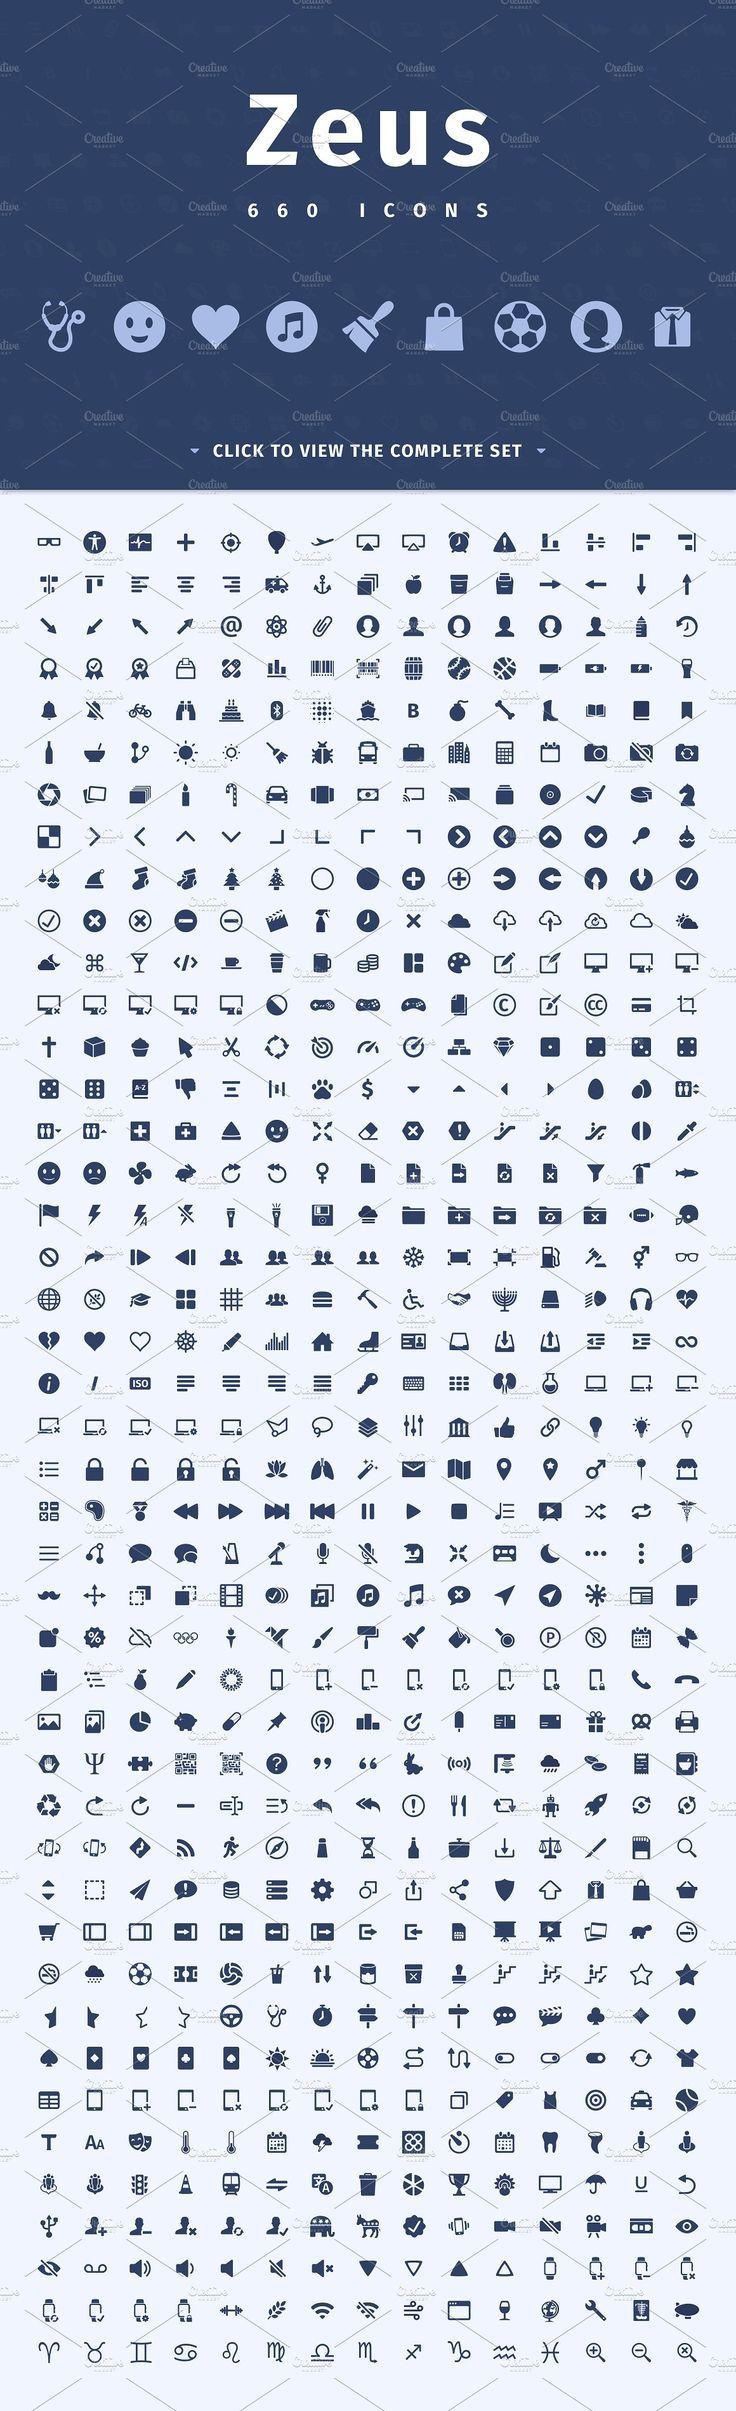 Zeus - 660 Icons Set by XusBadia on @creativemarket